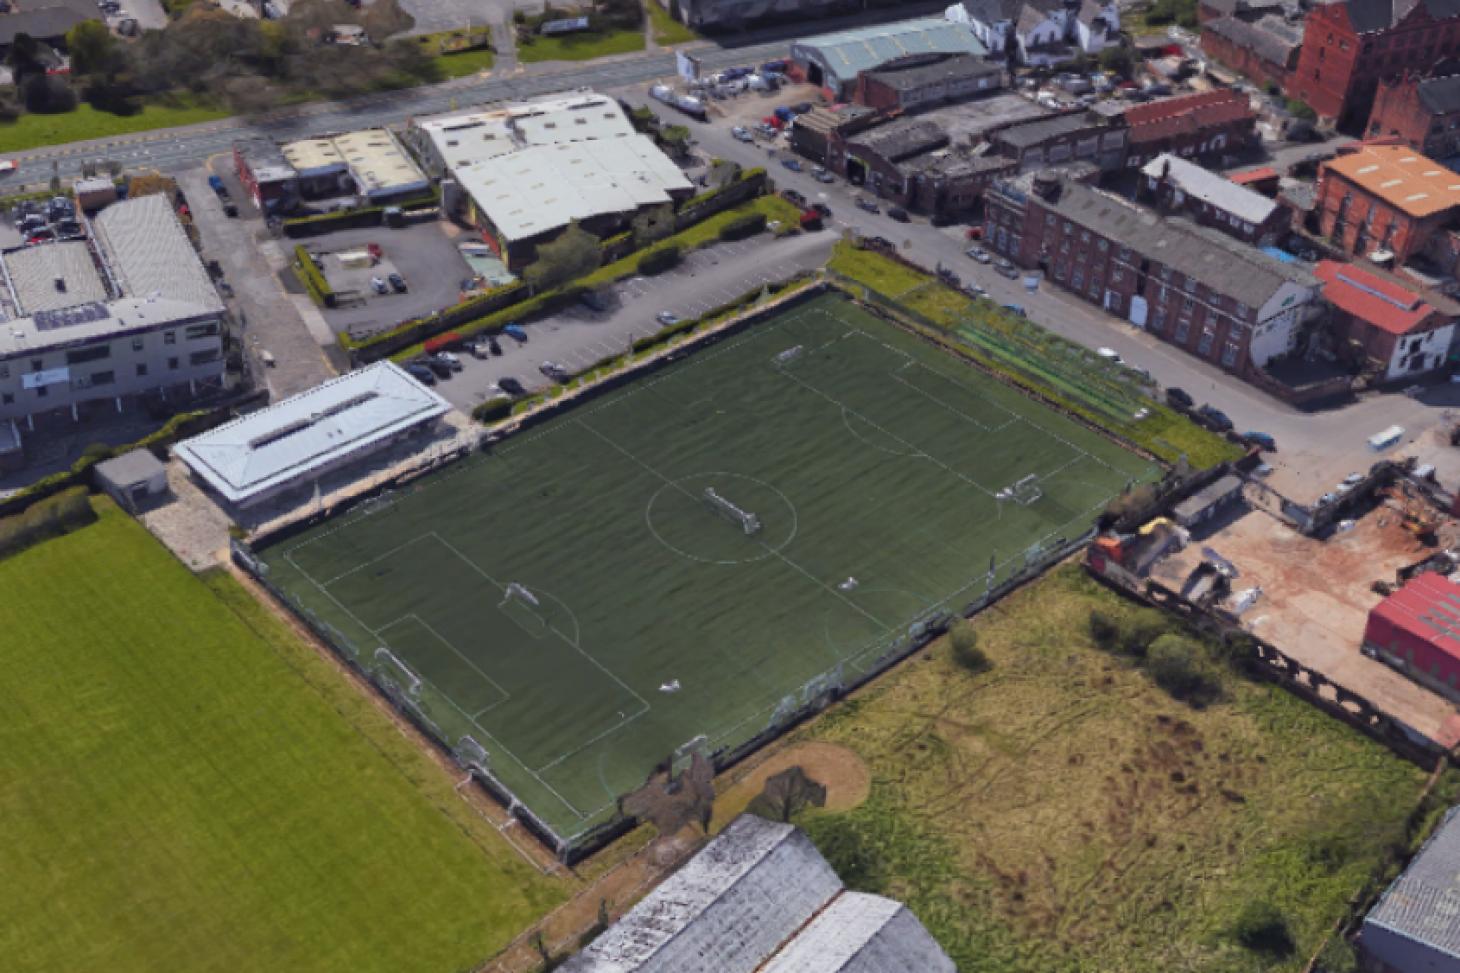 Nicholls Community Football Centre 11 a side | 3G Astroturf football pitch